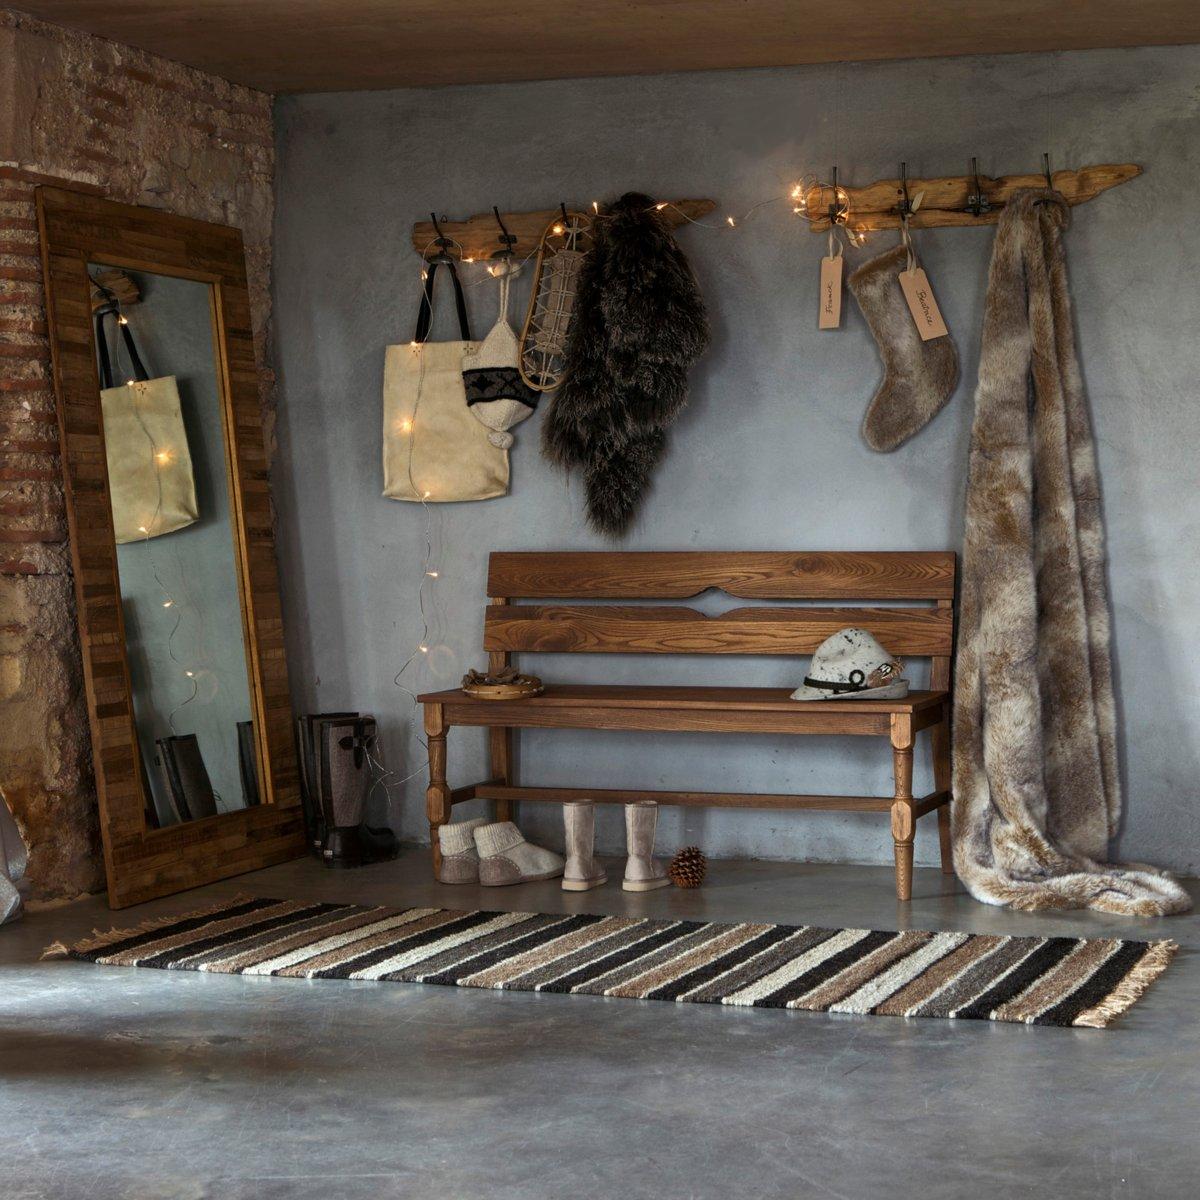 entr e scandinave banc en boic et miroir ampm dekobook. Black Bedroom Furniture Sets. Home Design Ideas